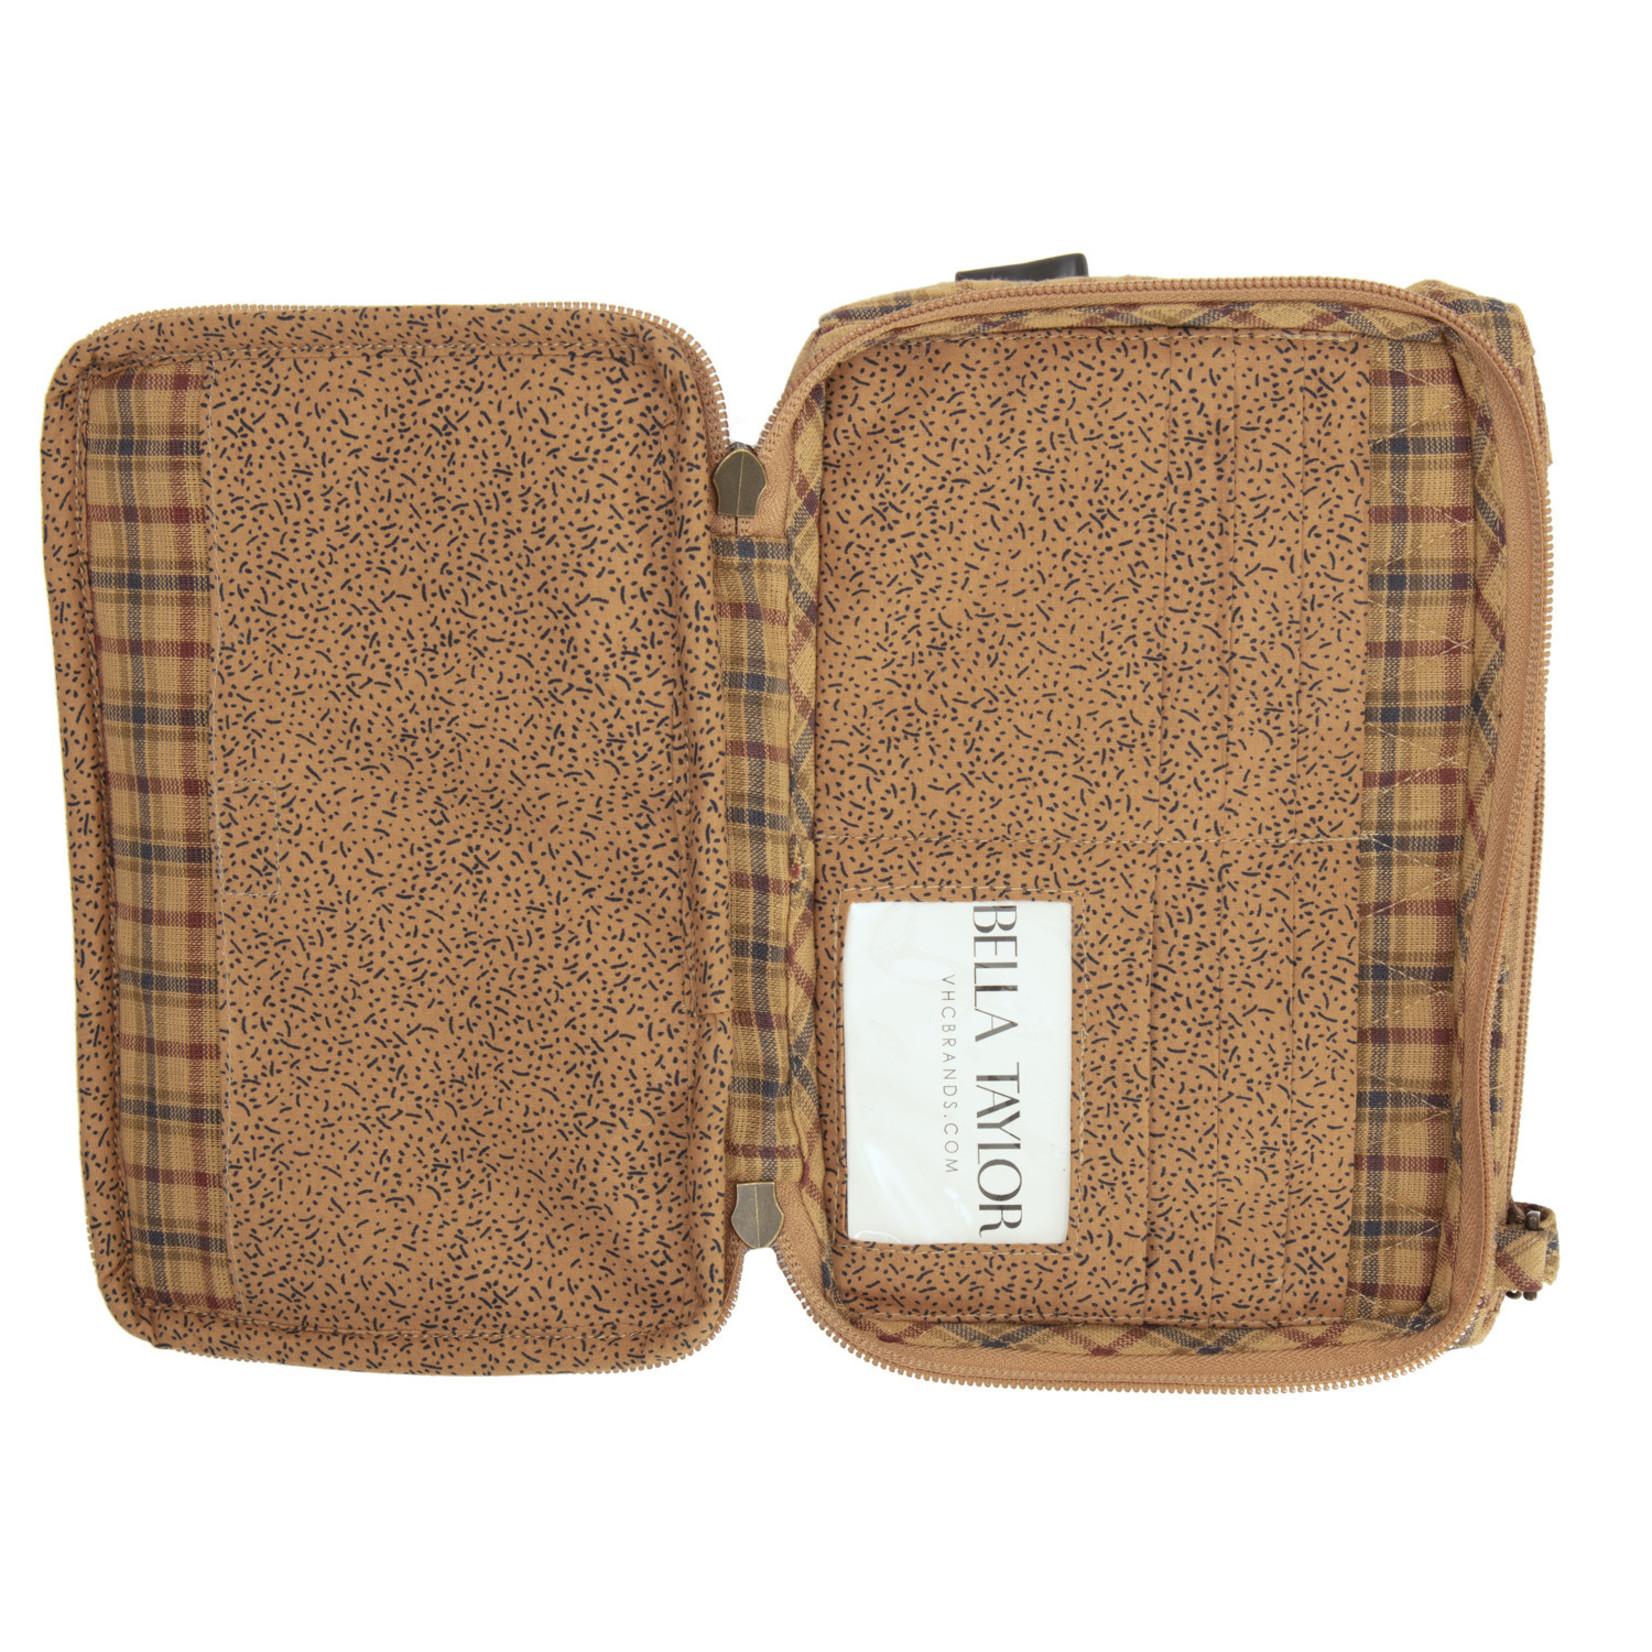 Bella Taylor Millsboro - Essentials handbag